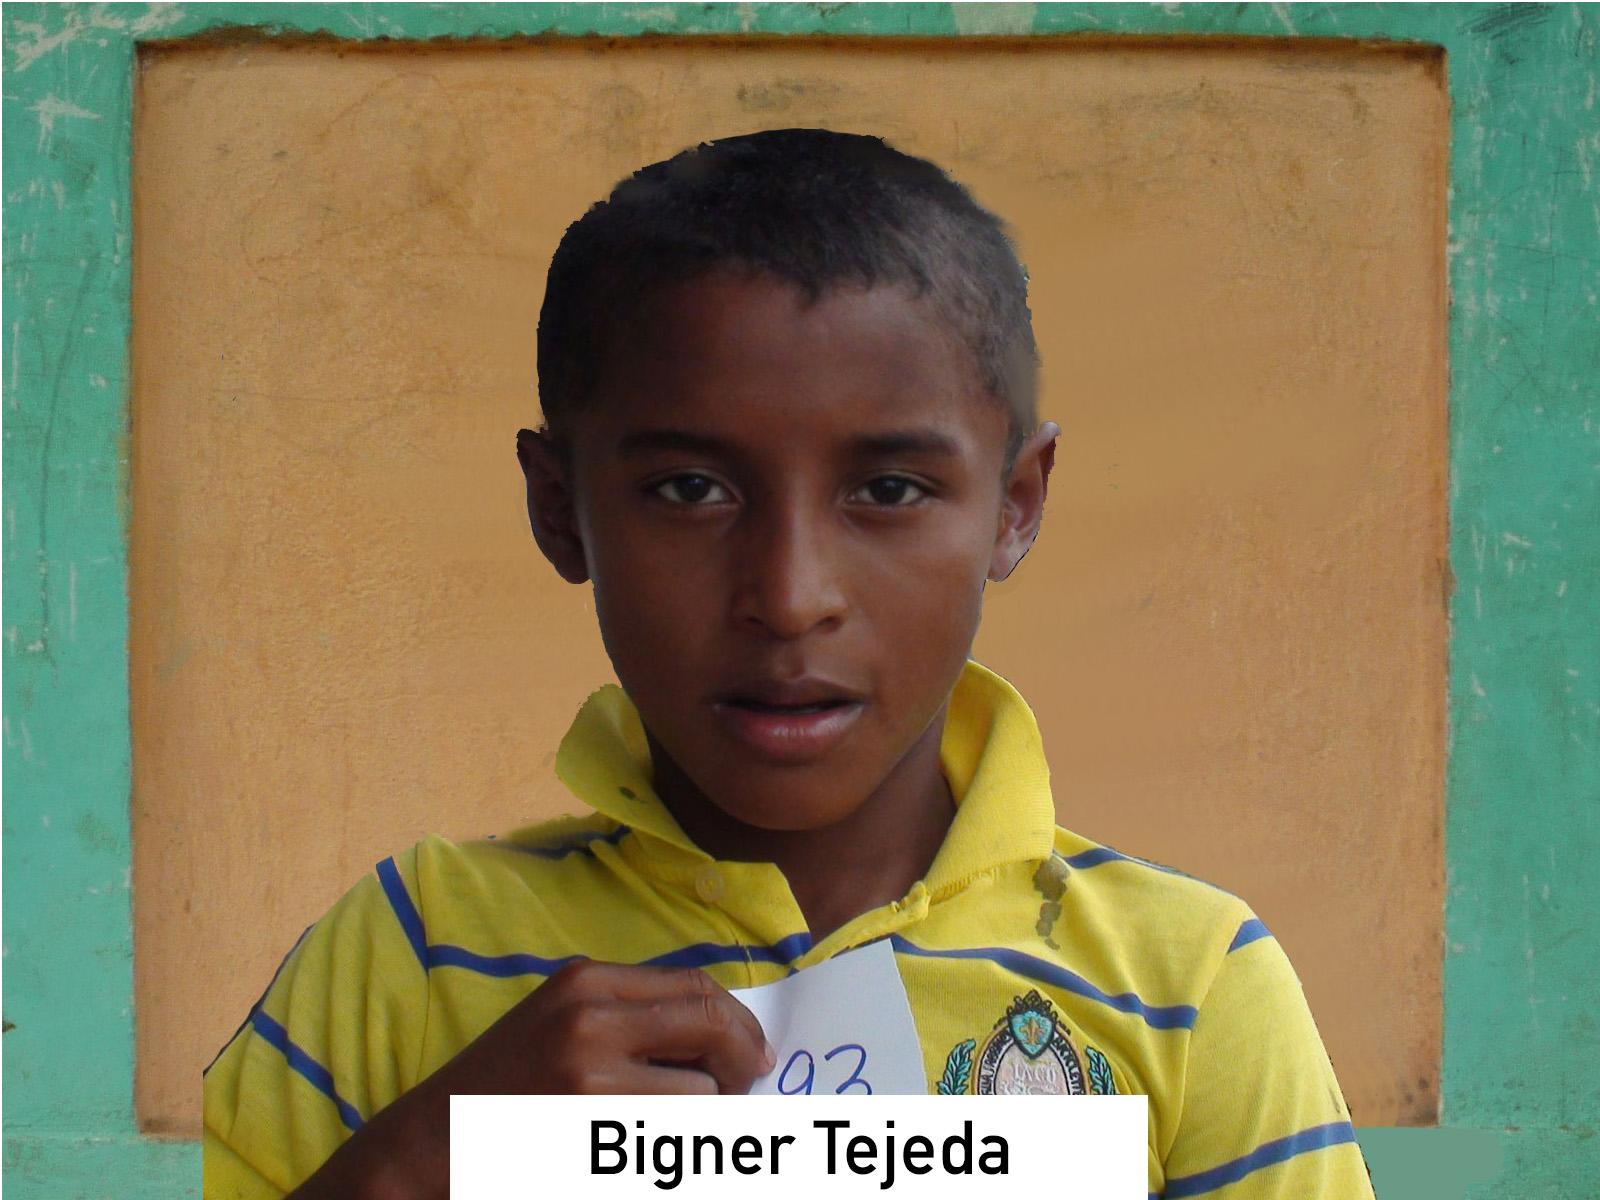 093 - Bigner Tejeda.jpg